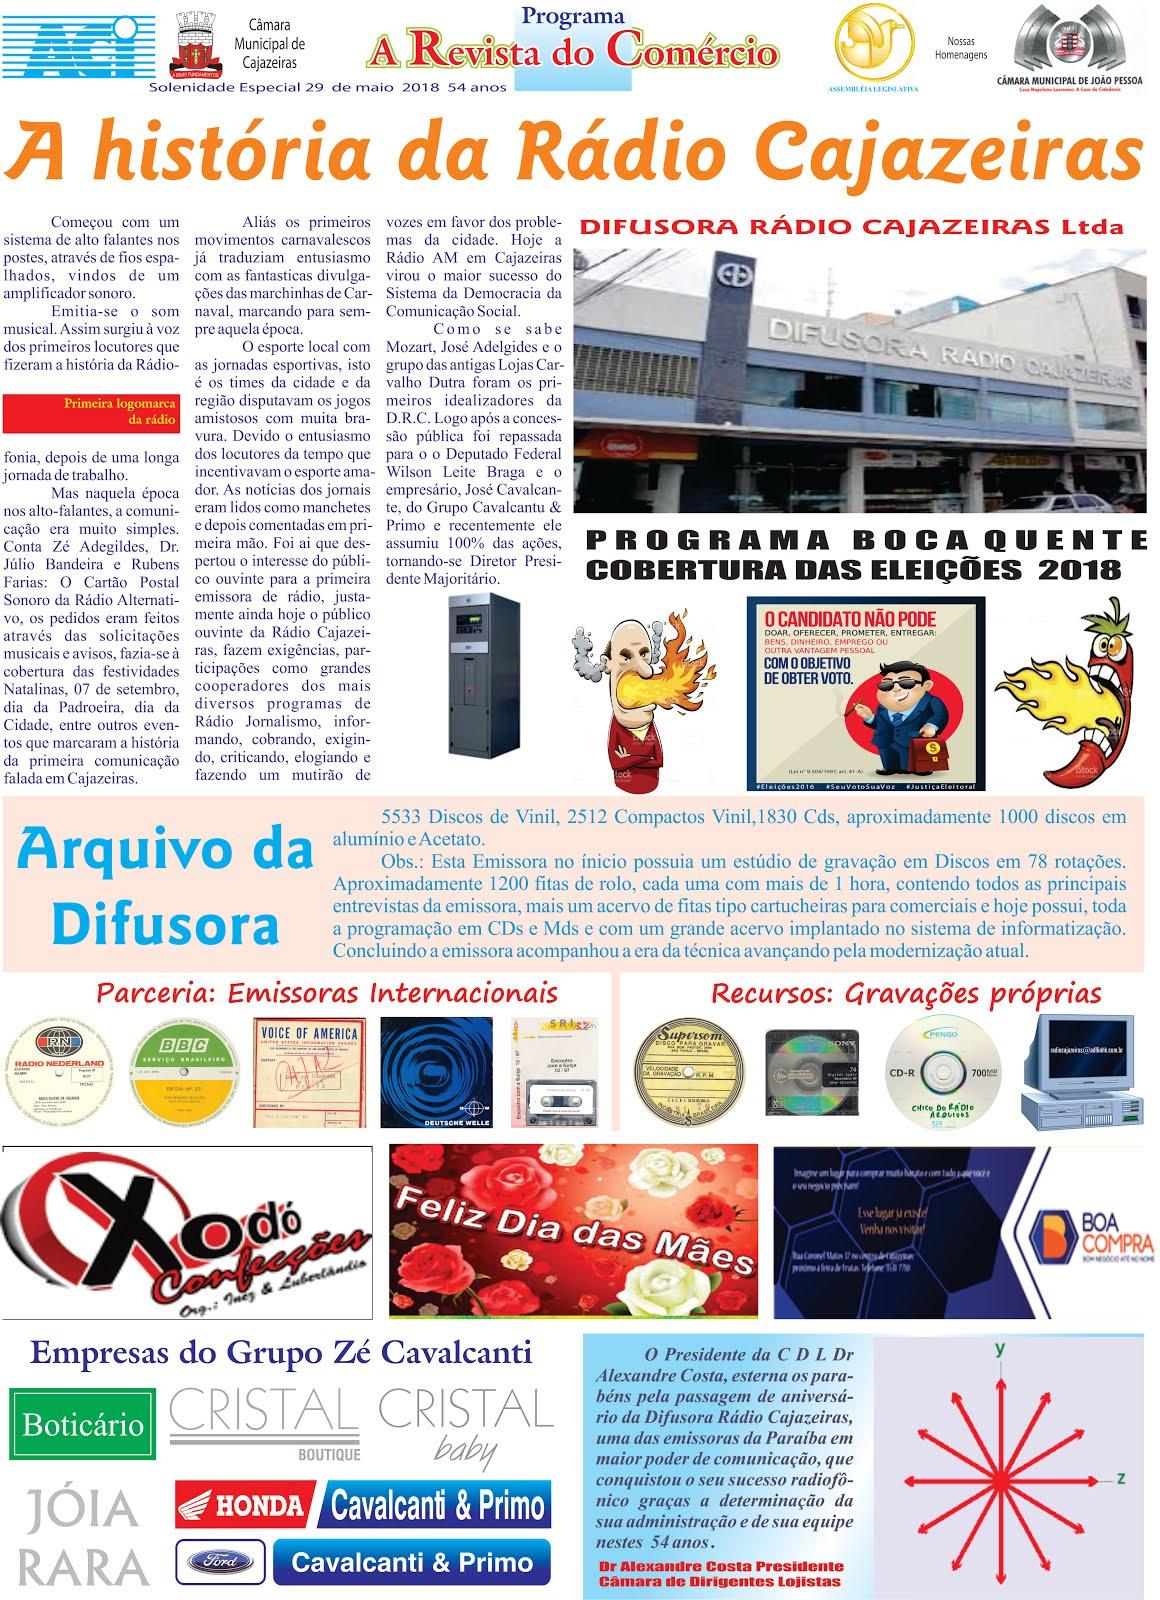 ANIVERSÁRIO DA DIFUSORA  RÁDIO CAJAZEIRAS  PARAÍBA